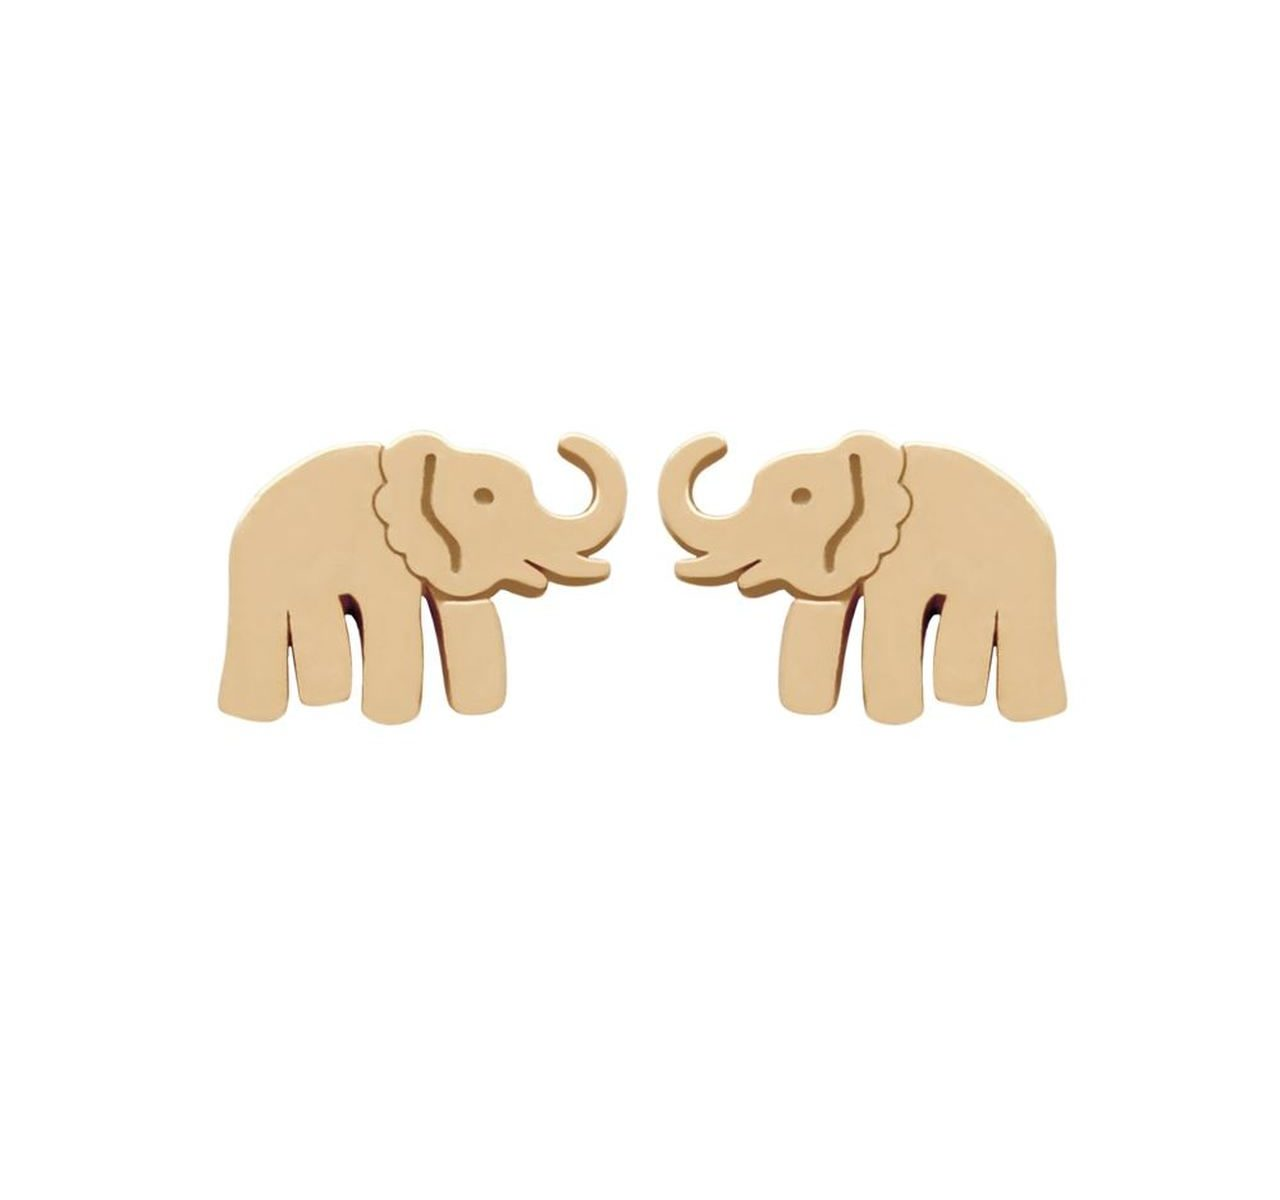 rose gold-plated nickel-free sterling silver elephant stud earrings